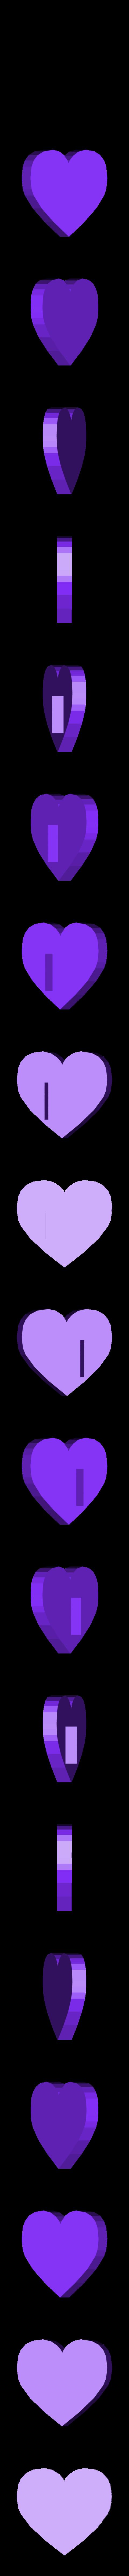 Heart button.stl Download STL file One piece flexible magnetic purse • 3D printable object, Aravon